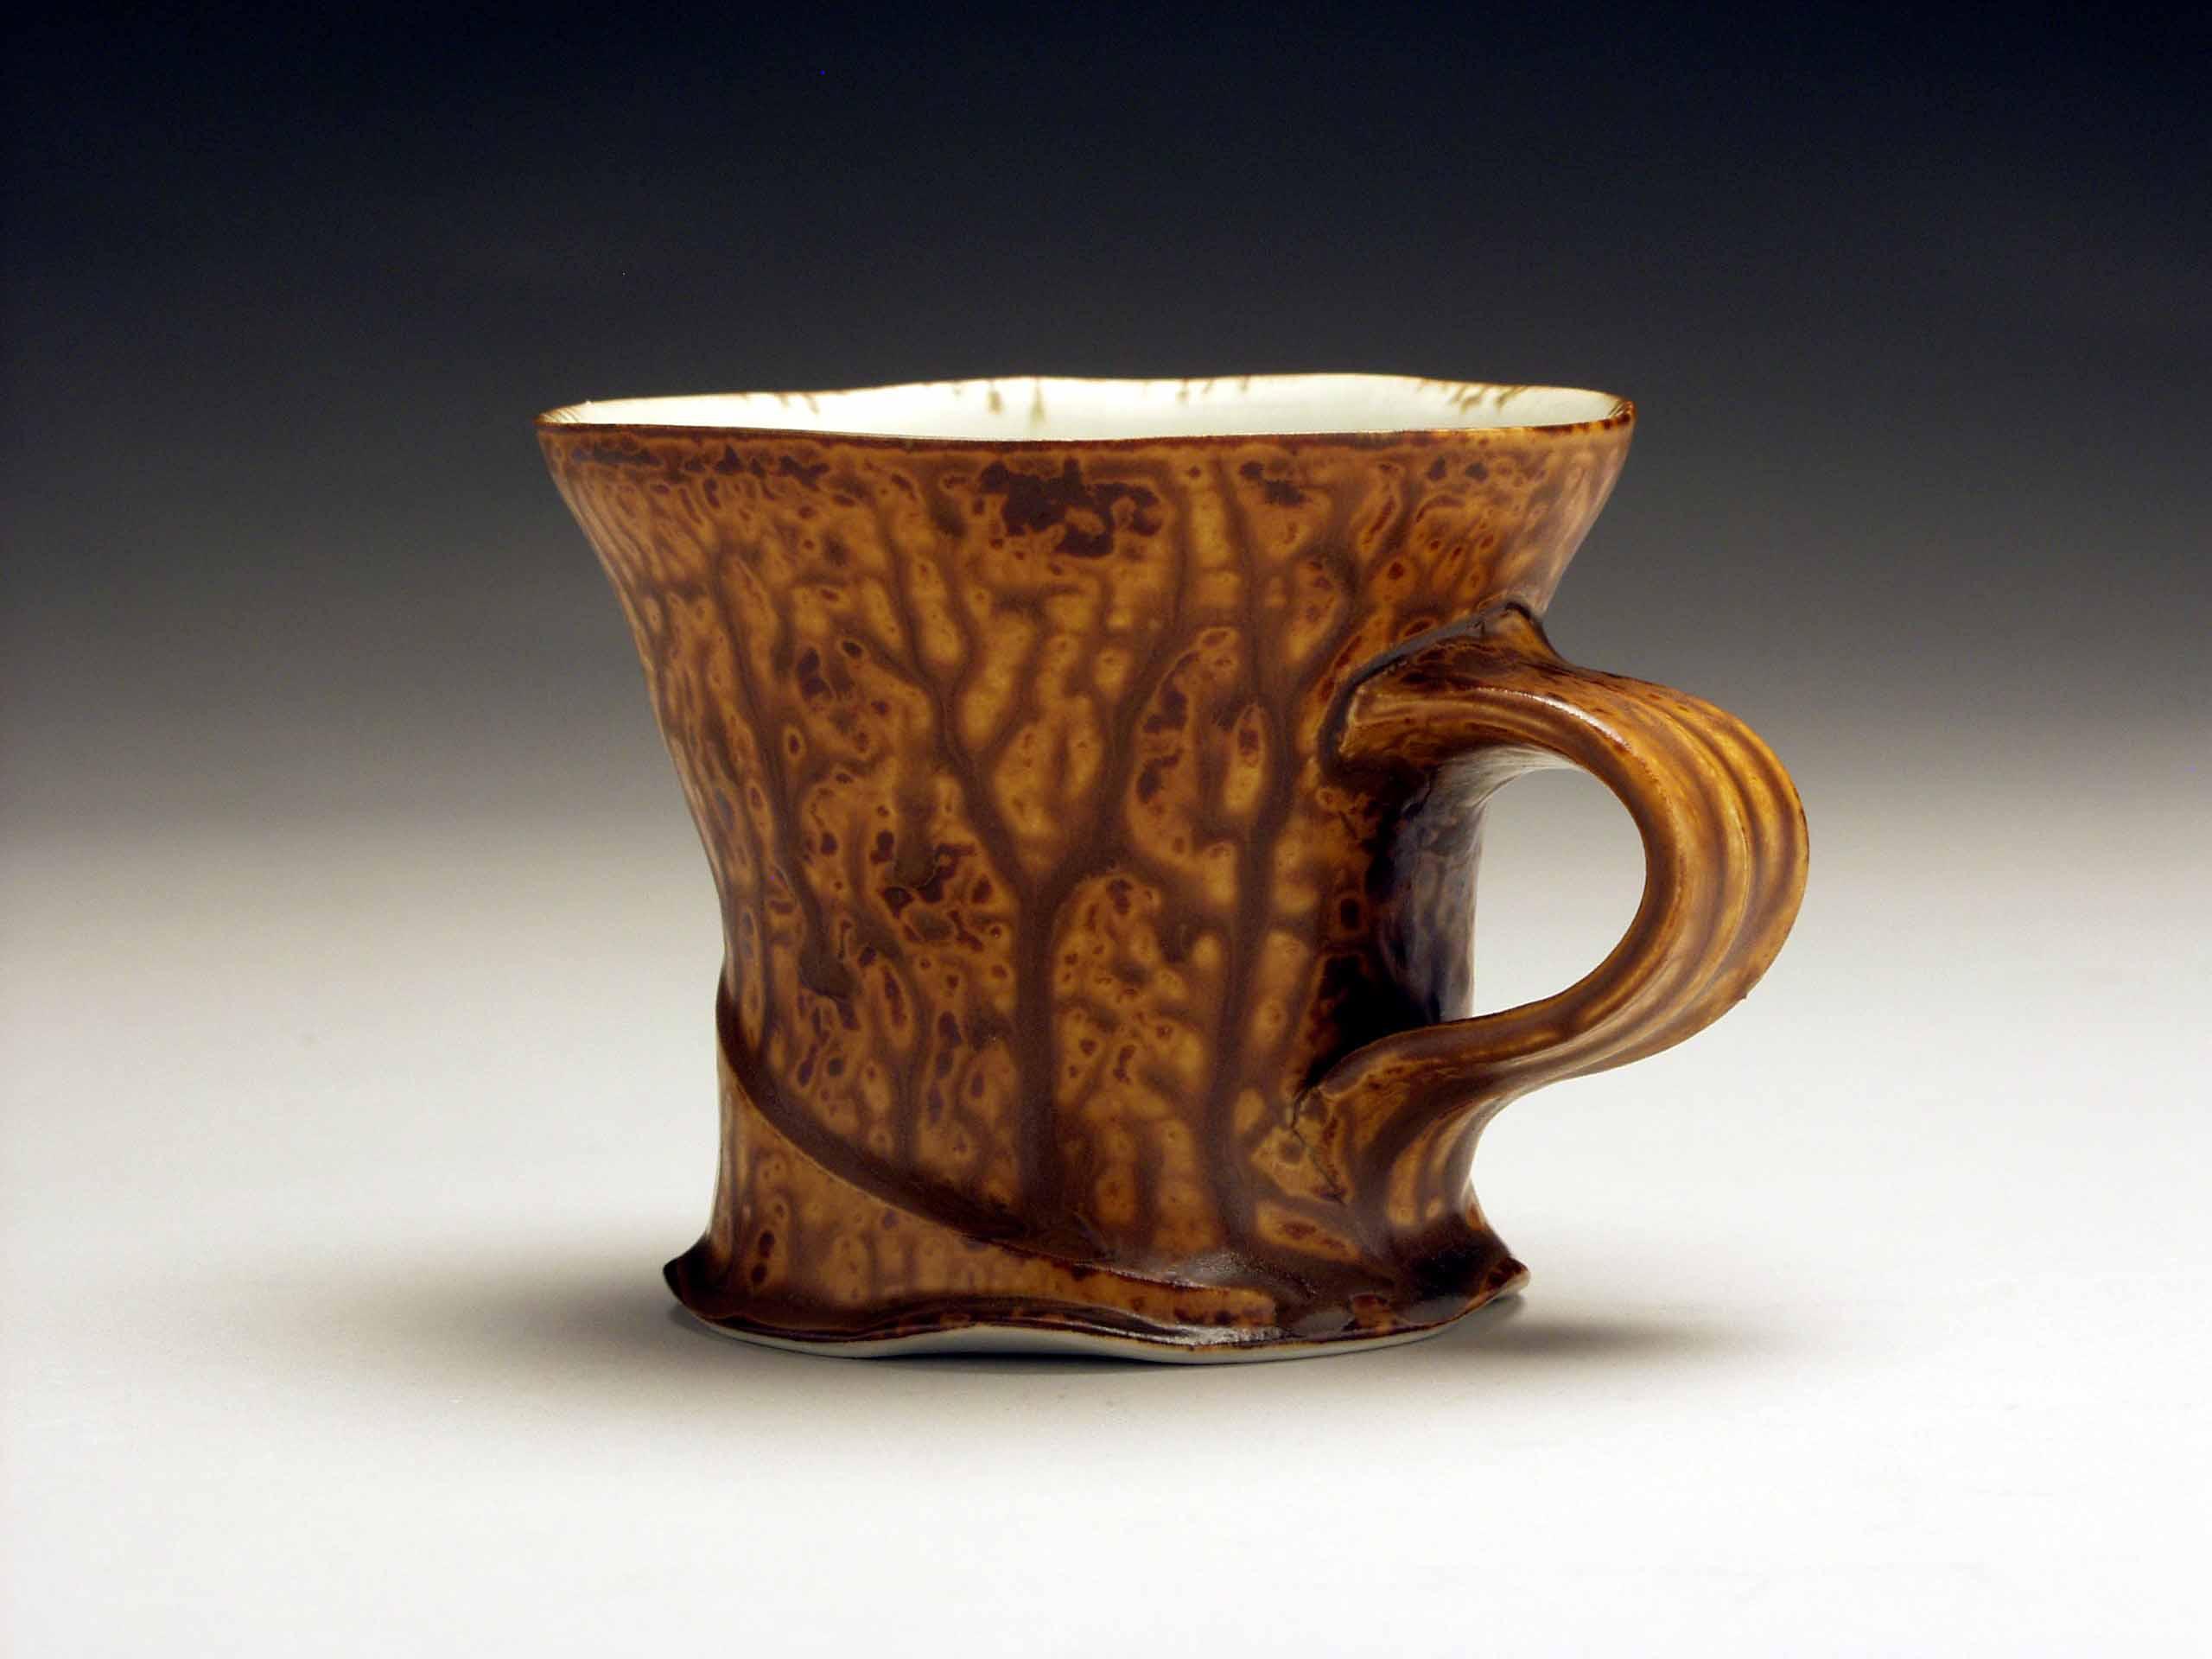 Distinctive Conner Burns Ash Glazed Mug Mugs Handles Conner Burns Mississippi Pottery Mugs Without Handles Making Pottery Mug Handles furniture Pottery Mug Handles